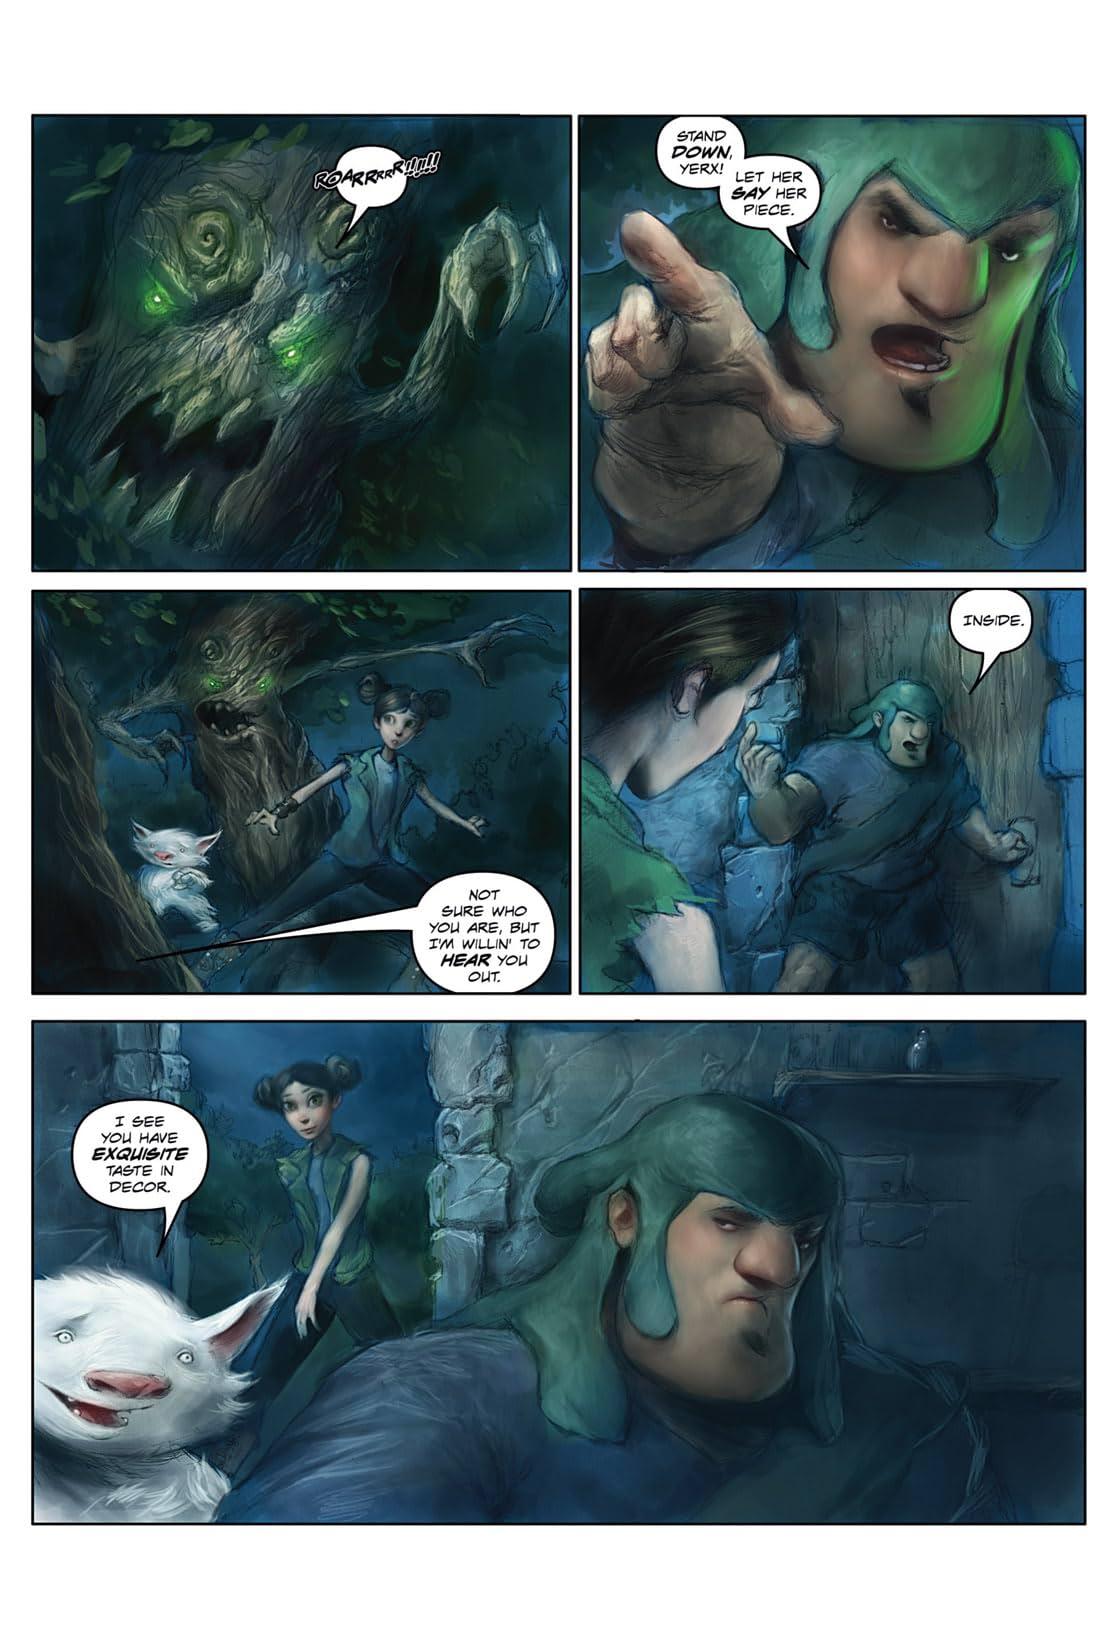 The Superfun Adventures of Jax #2